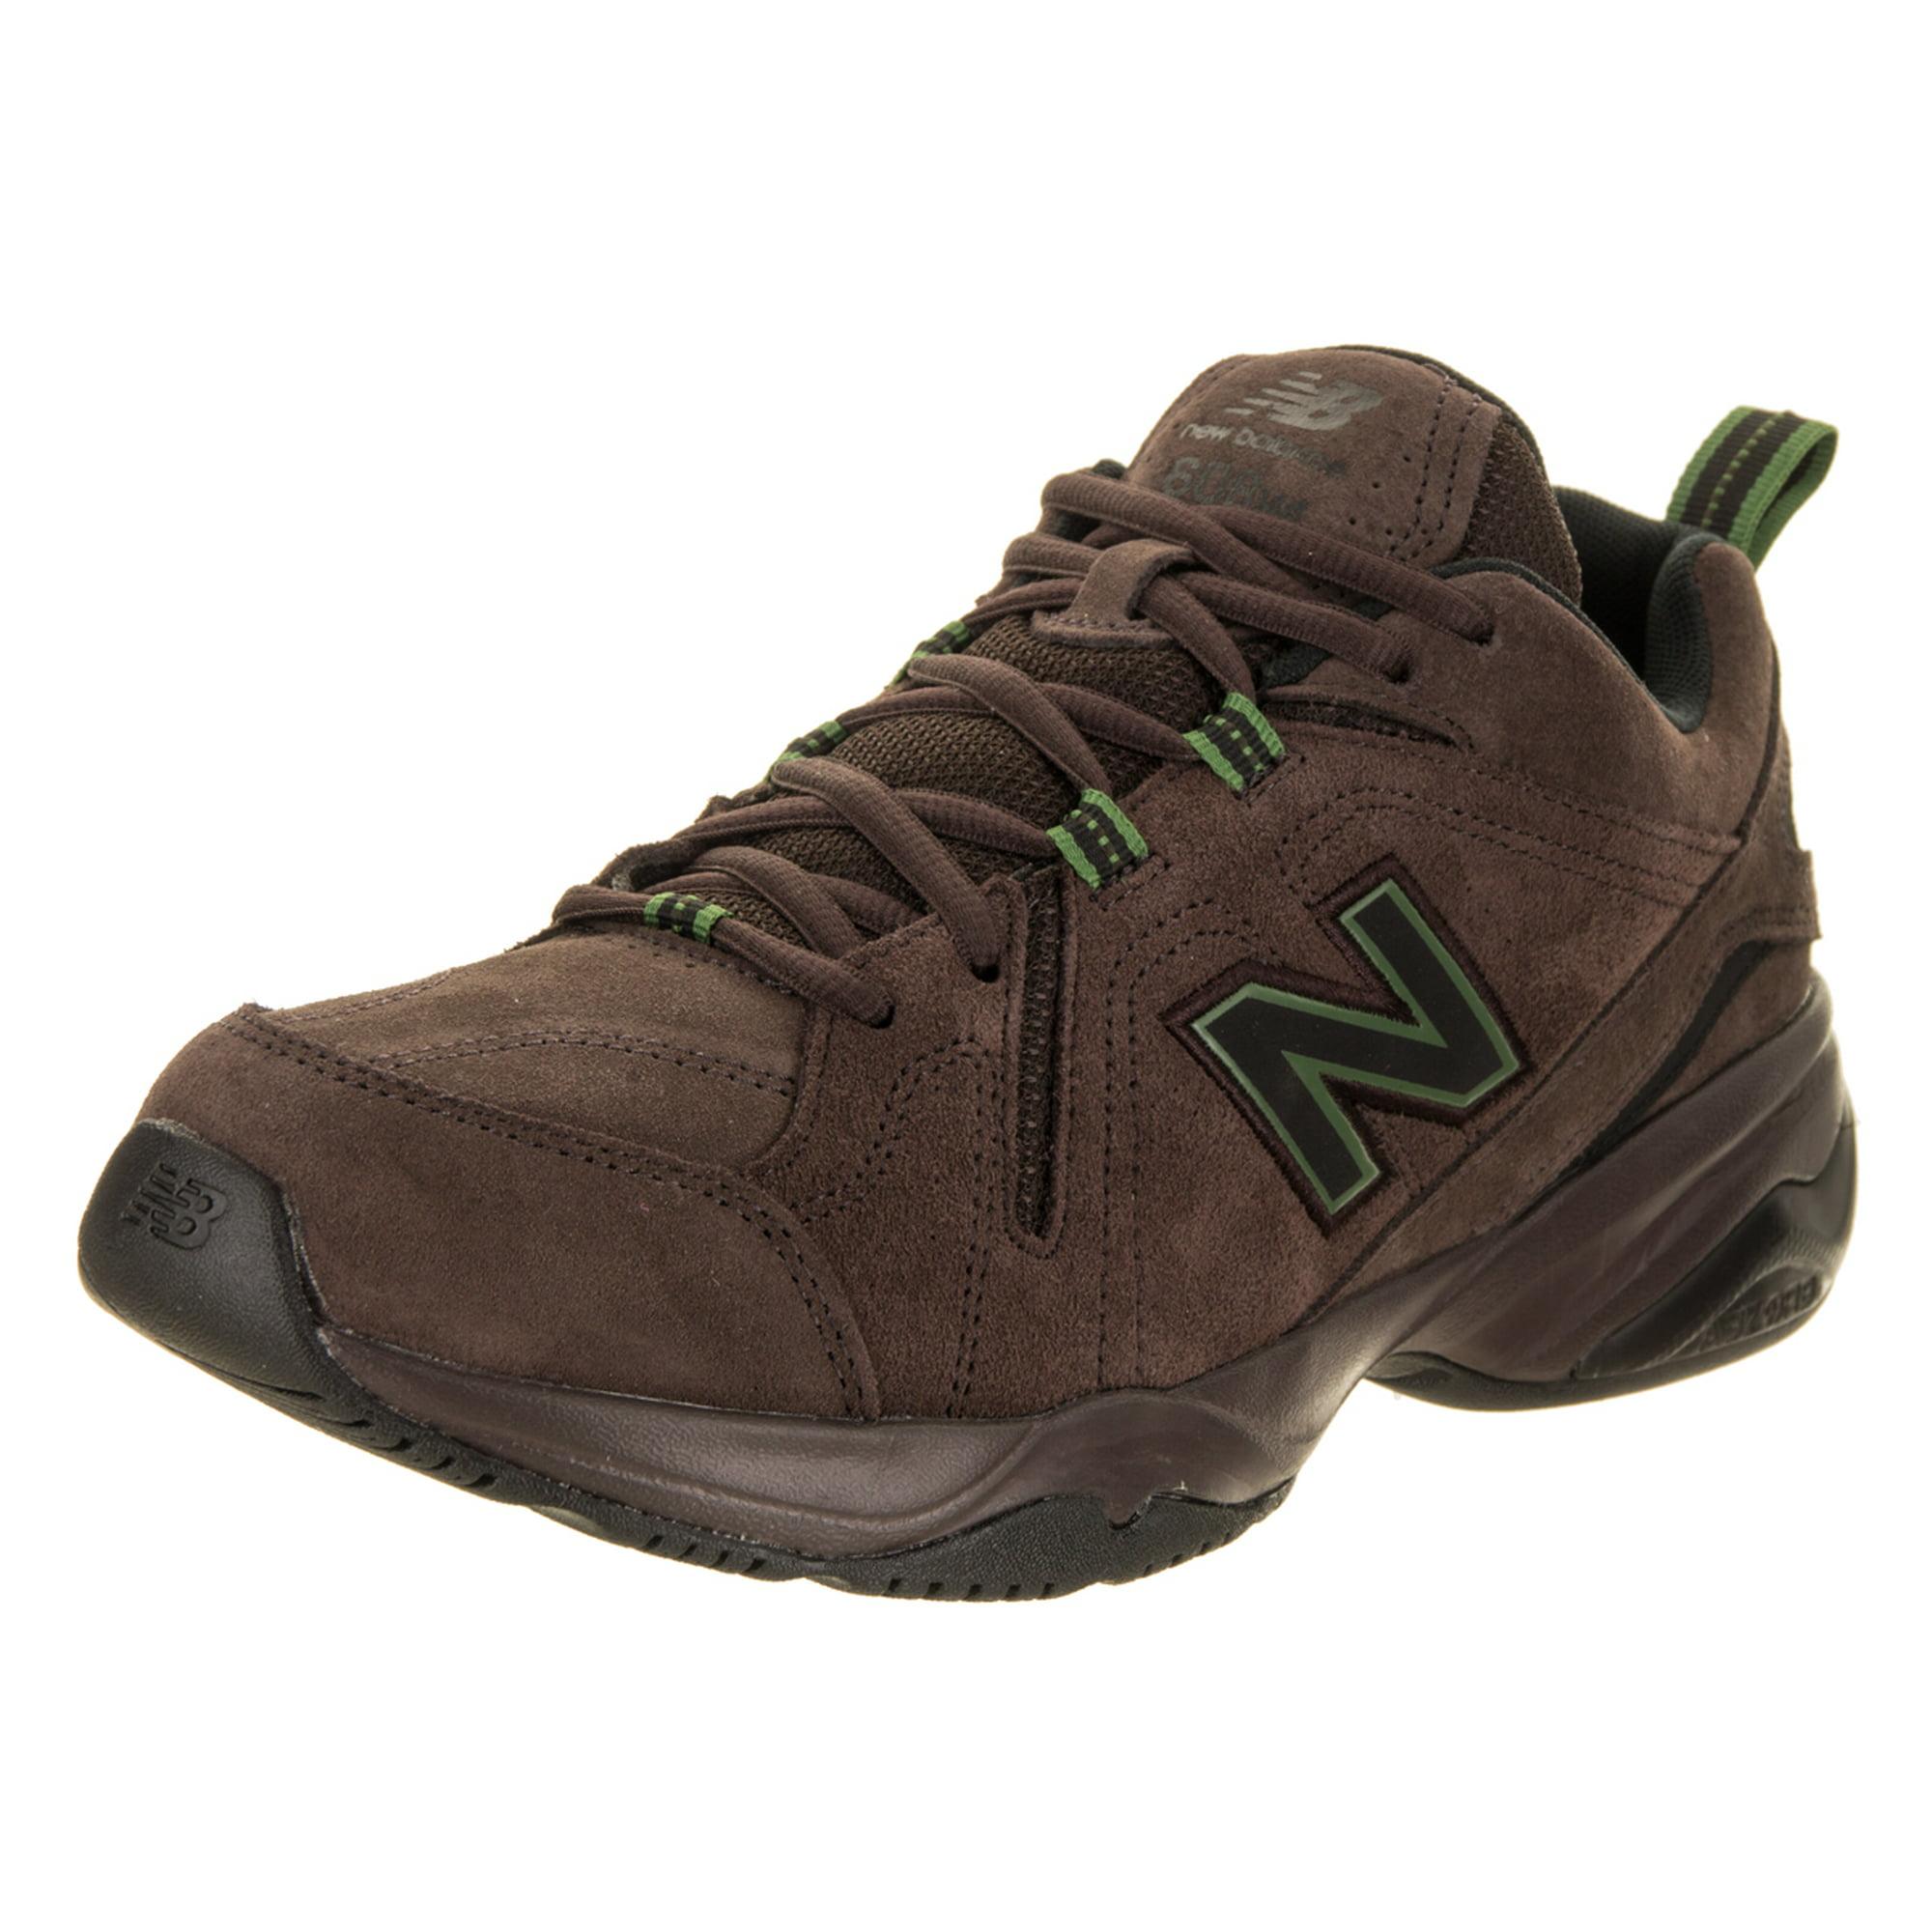 6845aa1fafc Buy New Balance Men s 608v4 Training Shoe